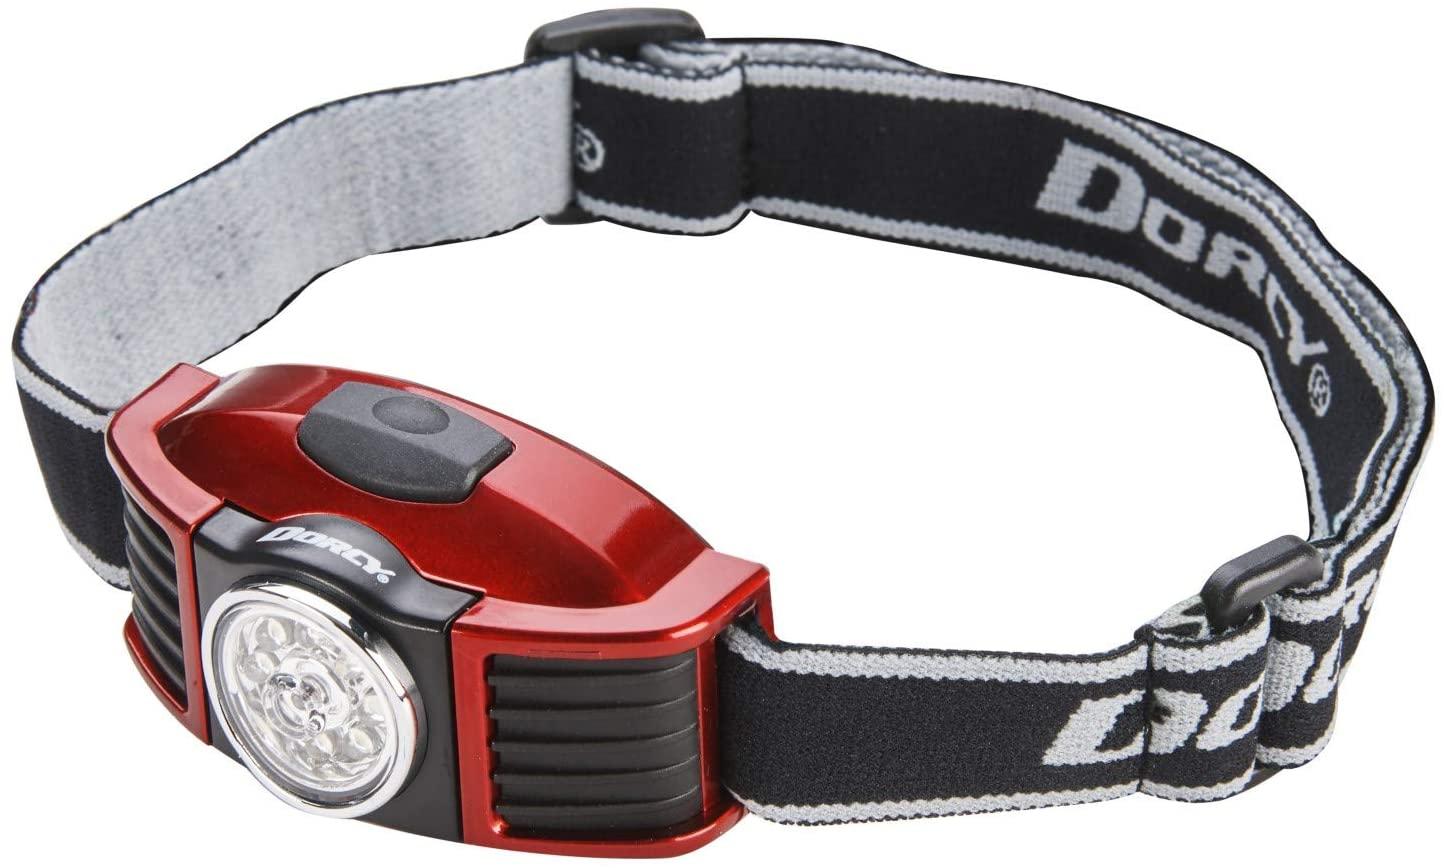 Dorcy 100-Lumen Weather Resistant Adjustable LED Headlight with Adjustable Head Strap, Black and Blue (41-2093)